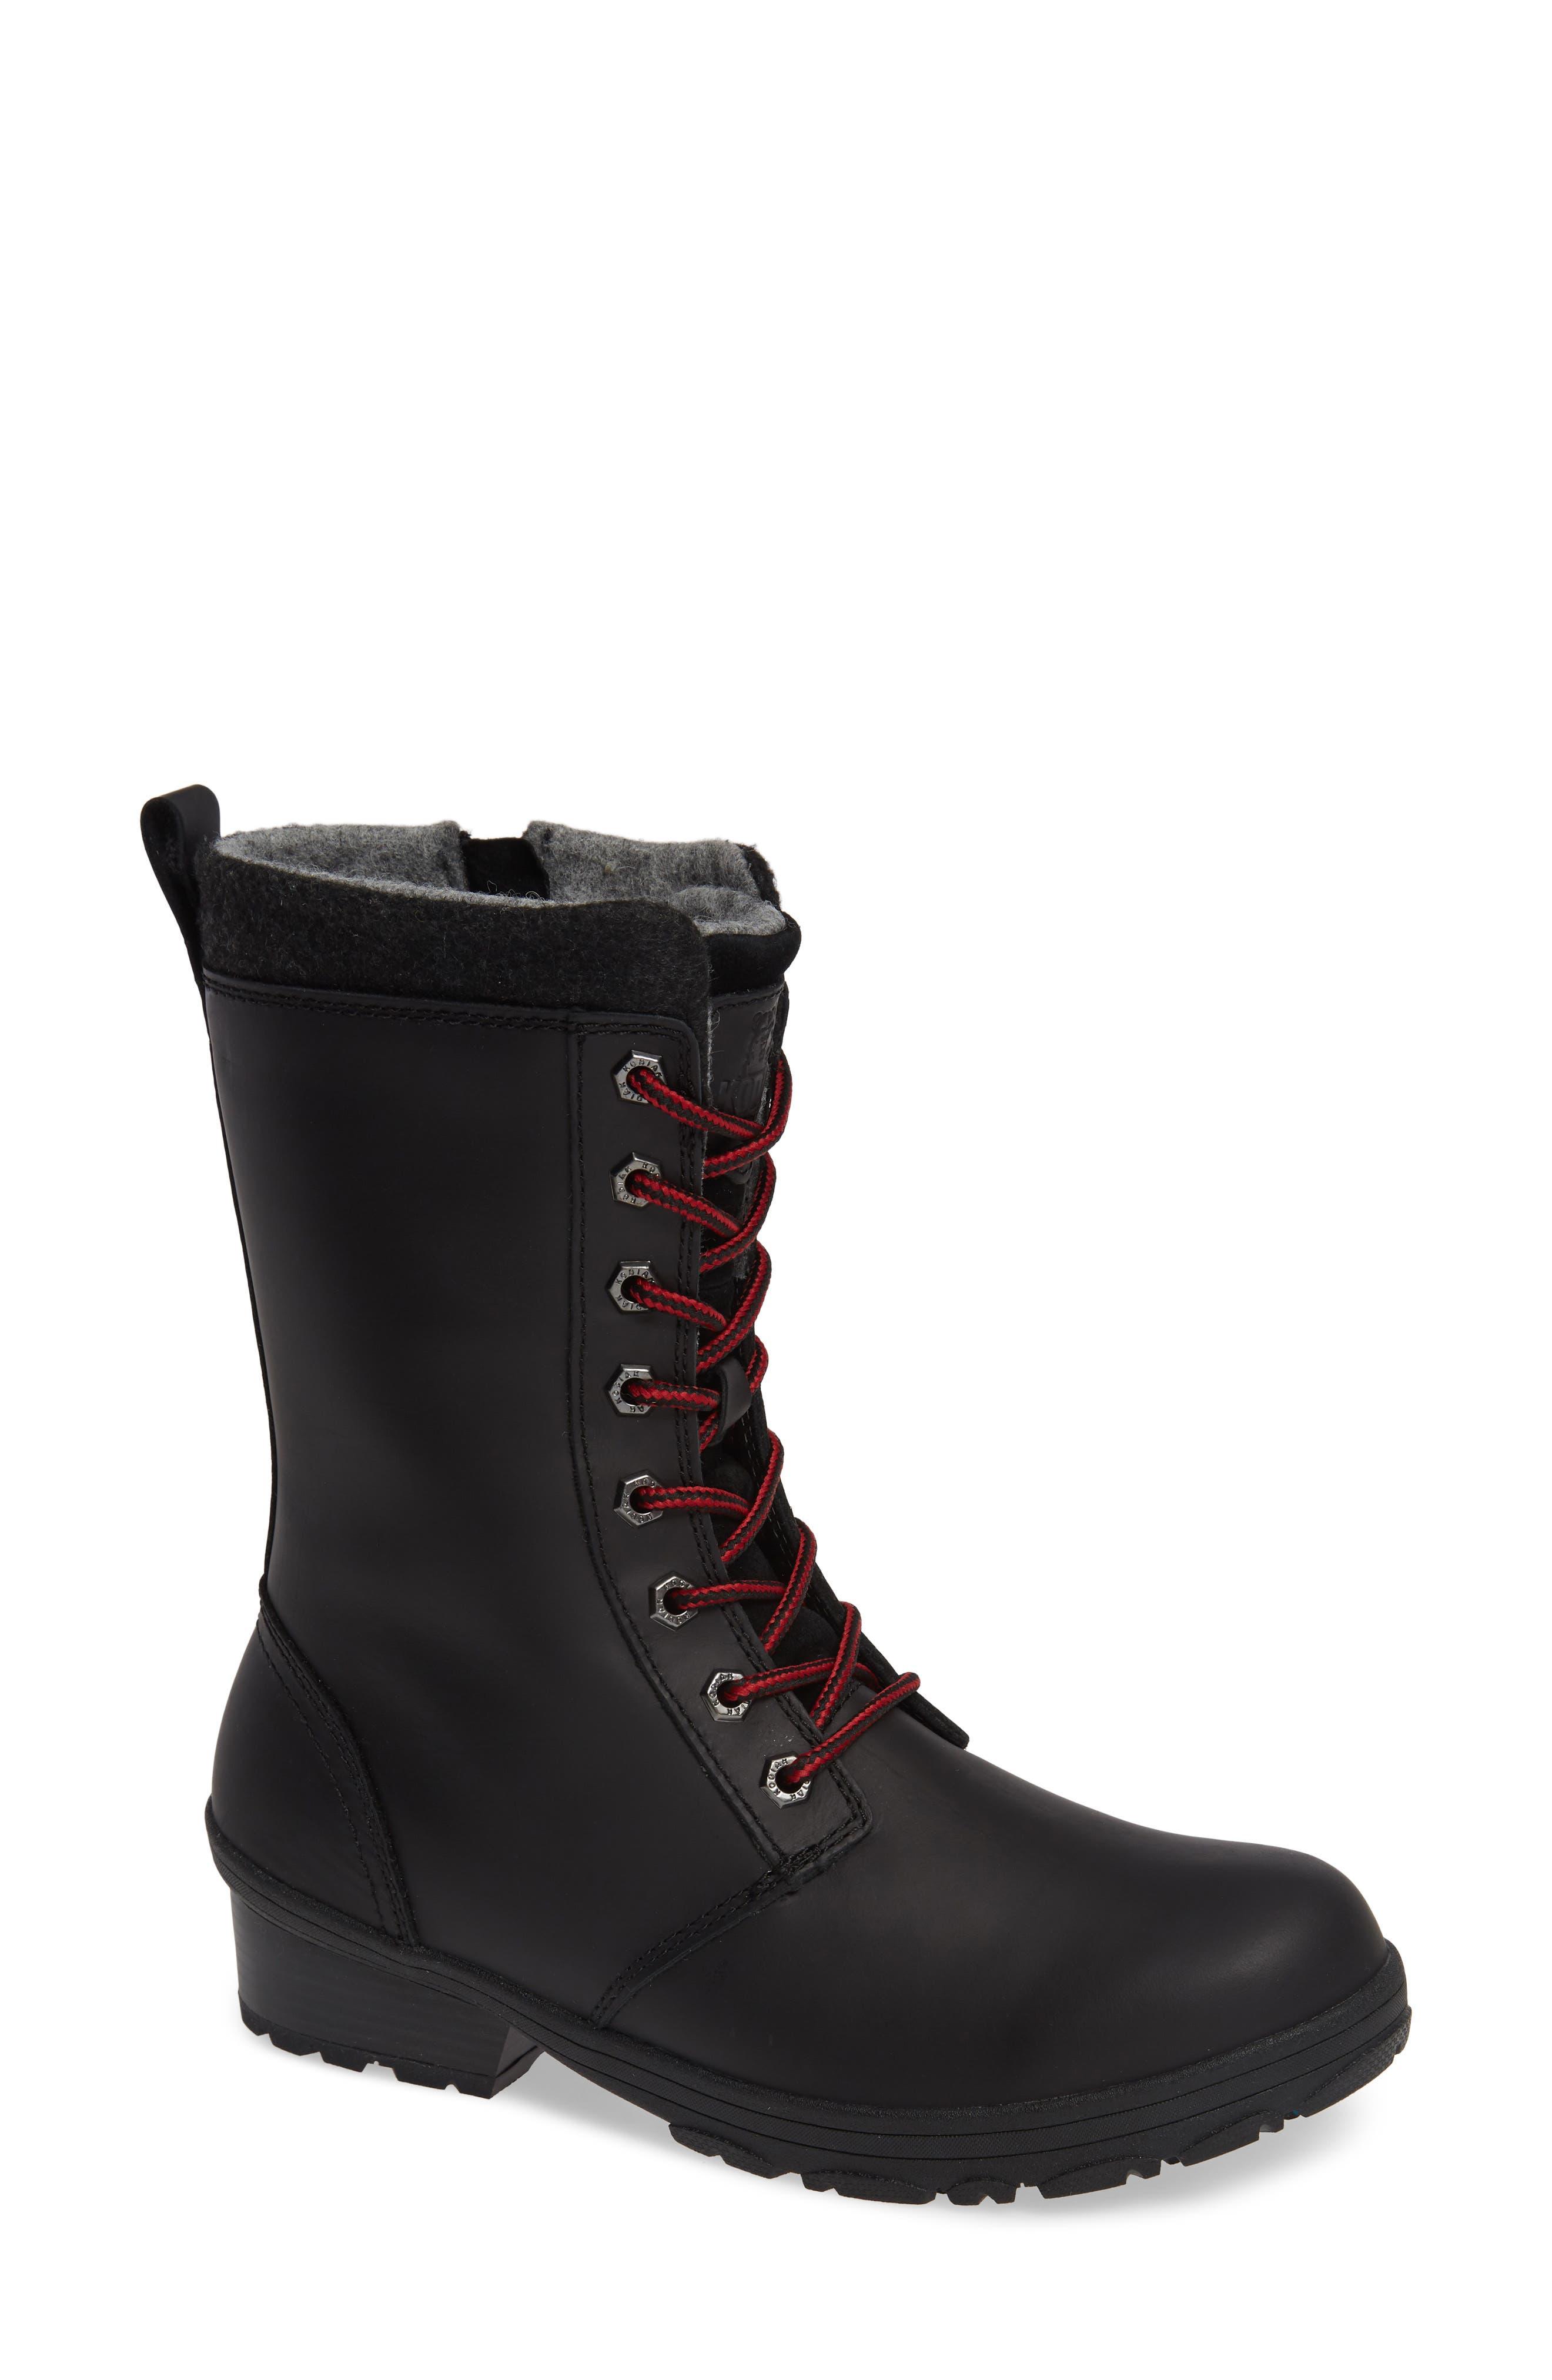 Kodiak Marcia Insulated Waterproof Boot, Black